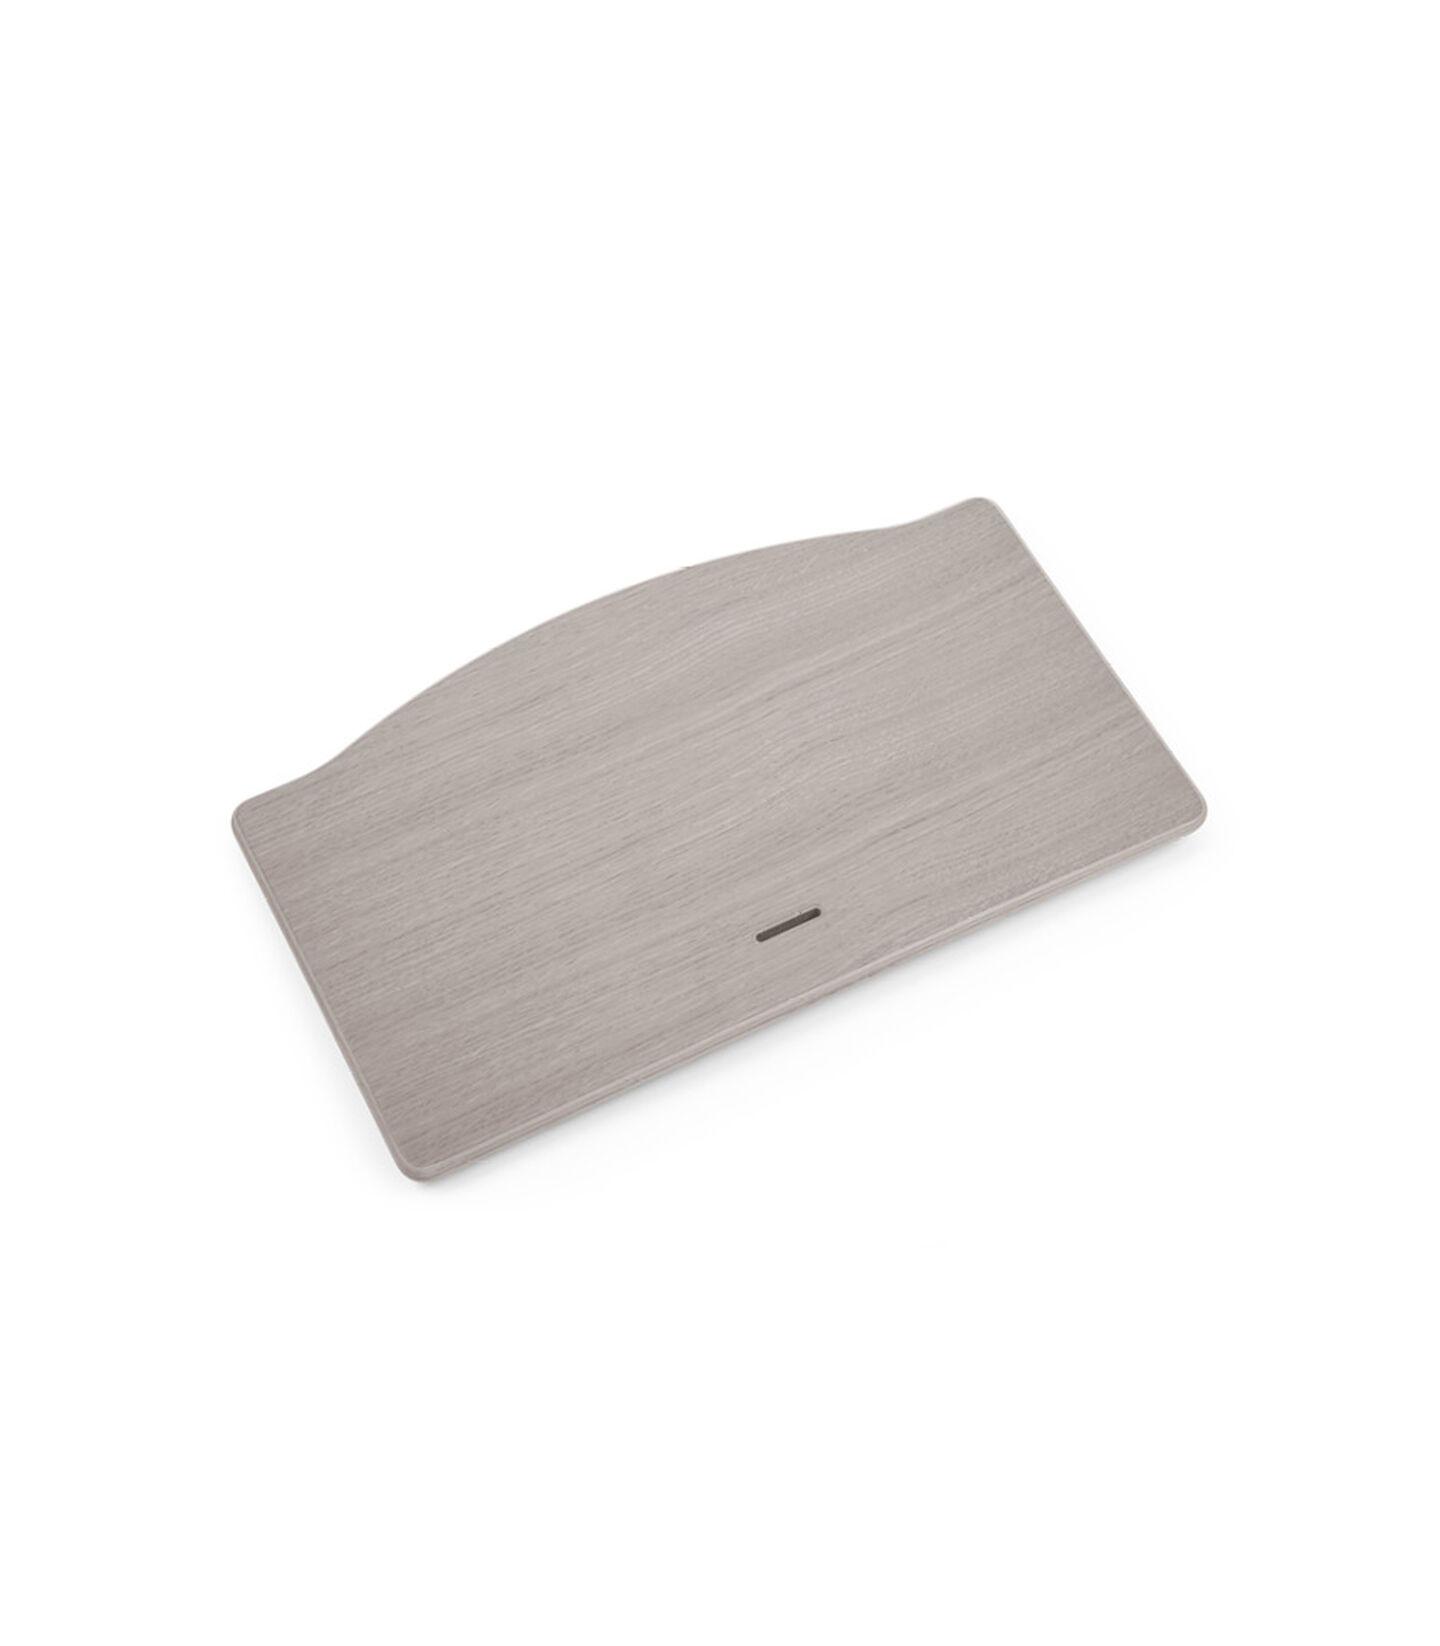 Tripp Trapp® Seatplate Oak Greywash, Oak Greywash, mainview view 2